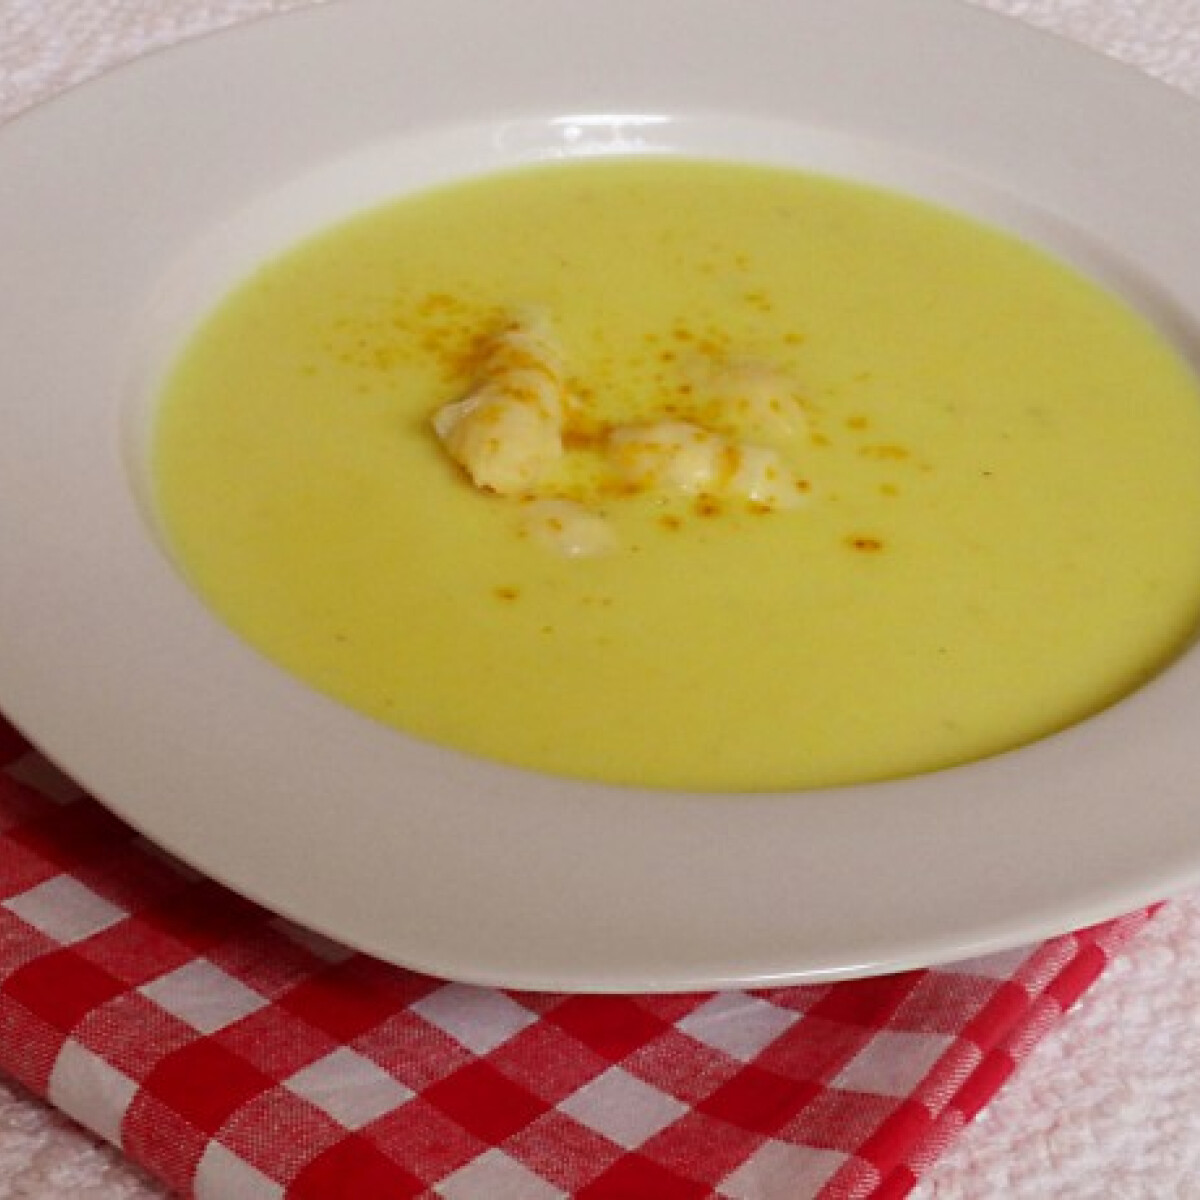 Ezen a képen: Curry-s spárgakrémleves